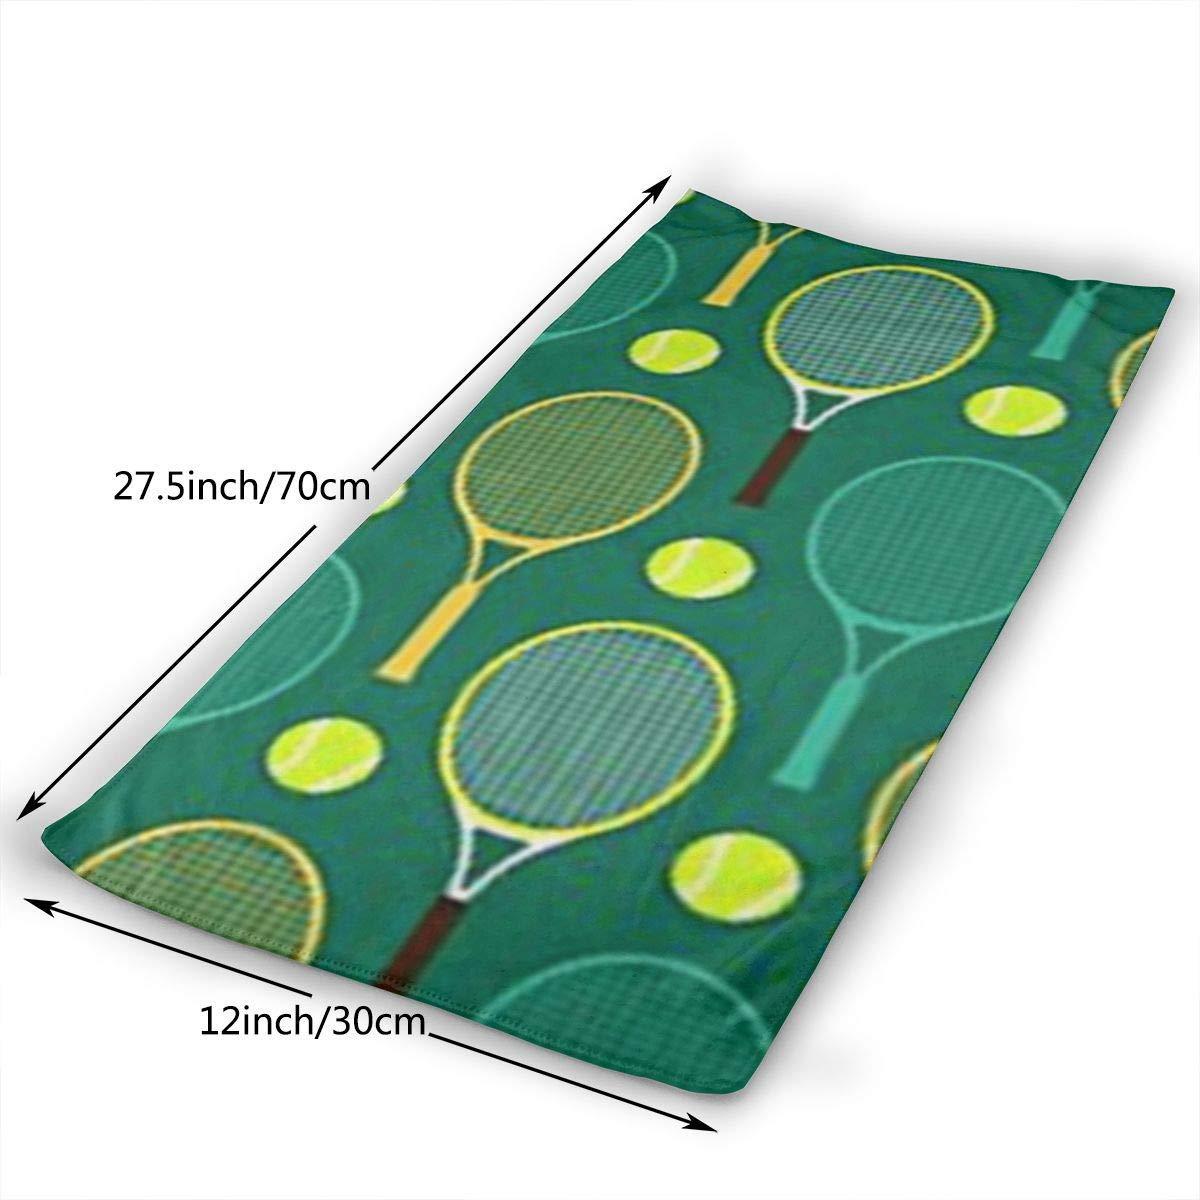 DAICHAI Blue and Green Tennis Rackets Microfiber Beach Towel Large & Oversized - 11.8